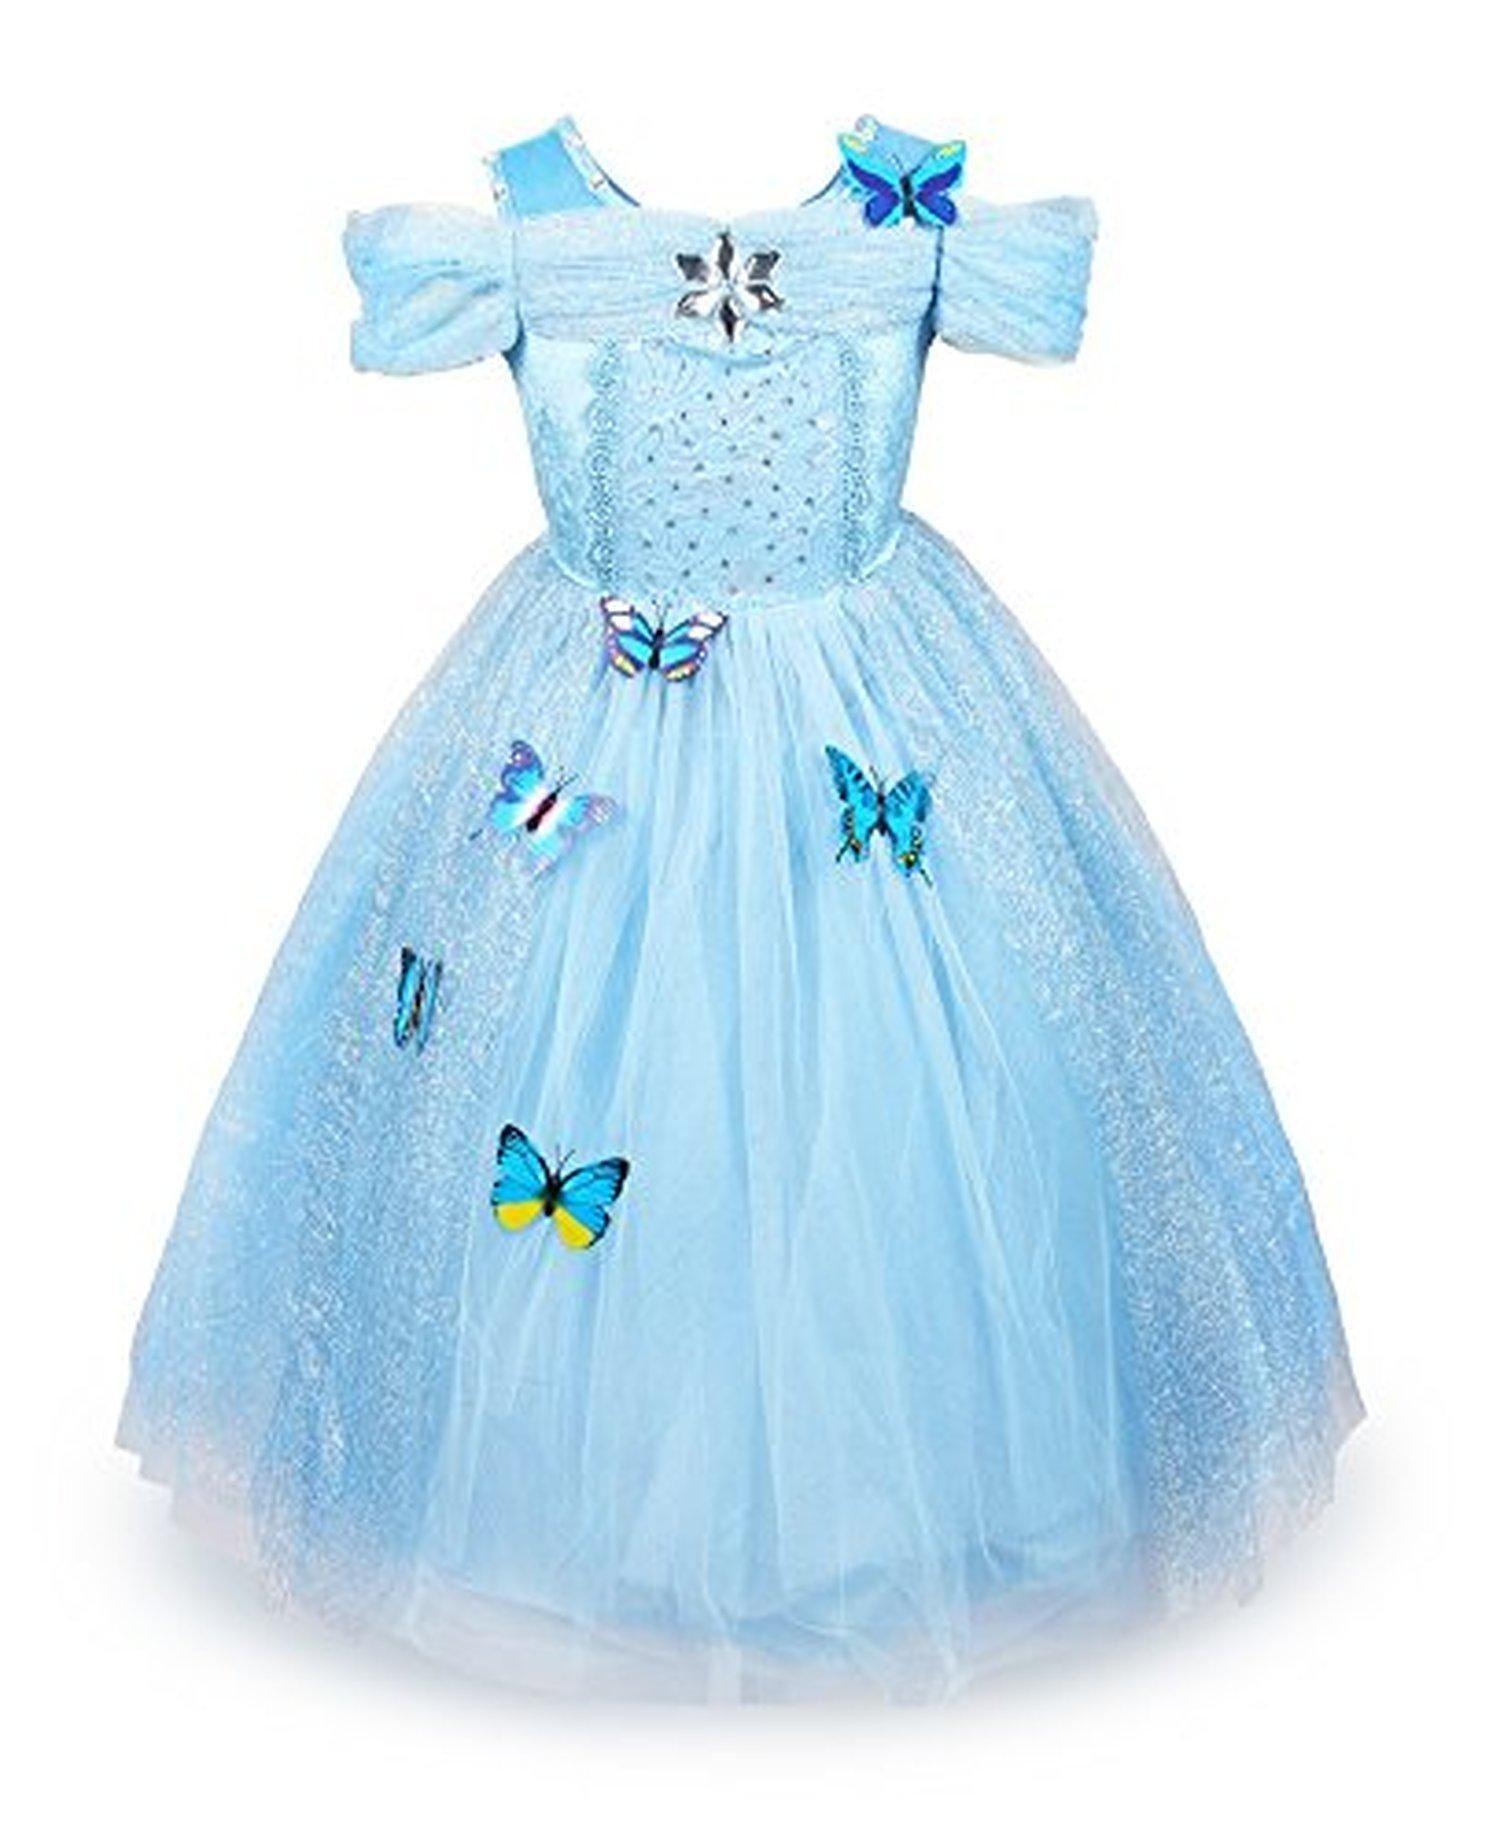 e7decffe2fb5 ReliBeauty Girls Cinderella Dress Halloween Costume (6x-7